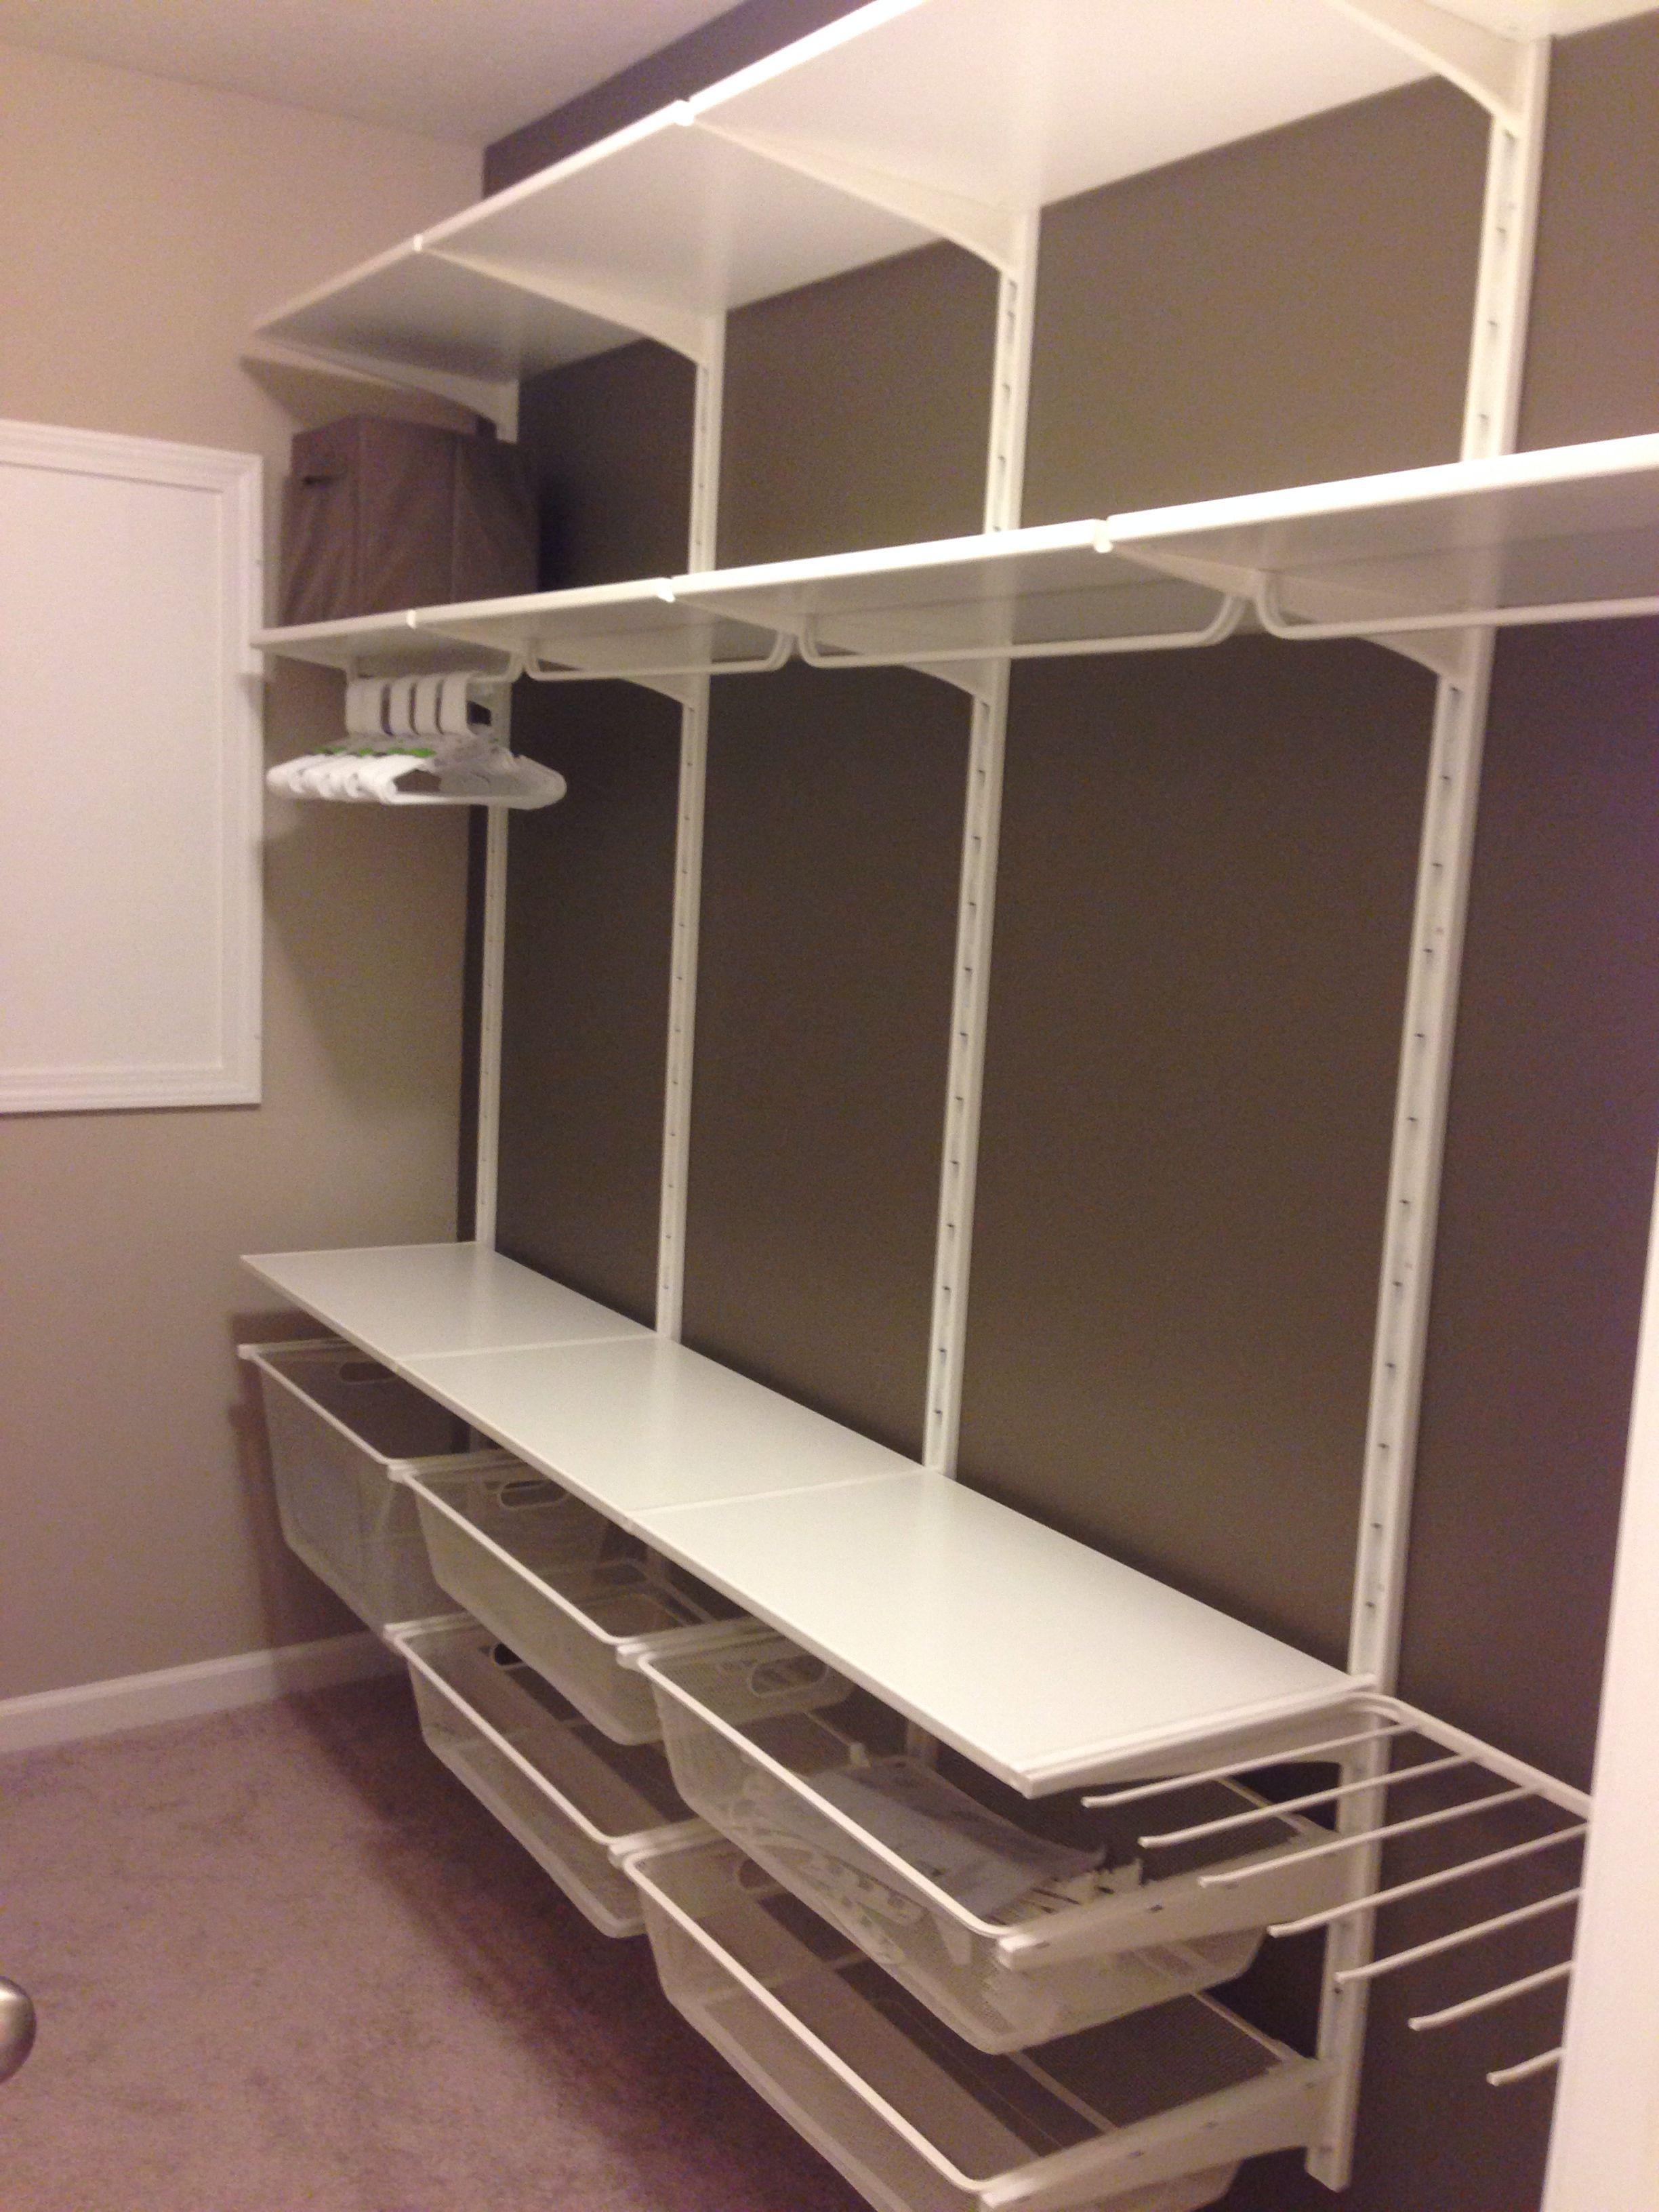 Nursery Closet Ikea Algot System Cest Le Modèle Algot